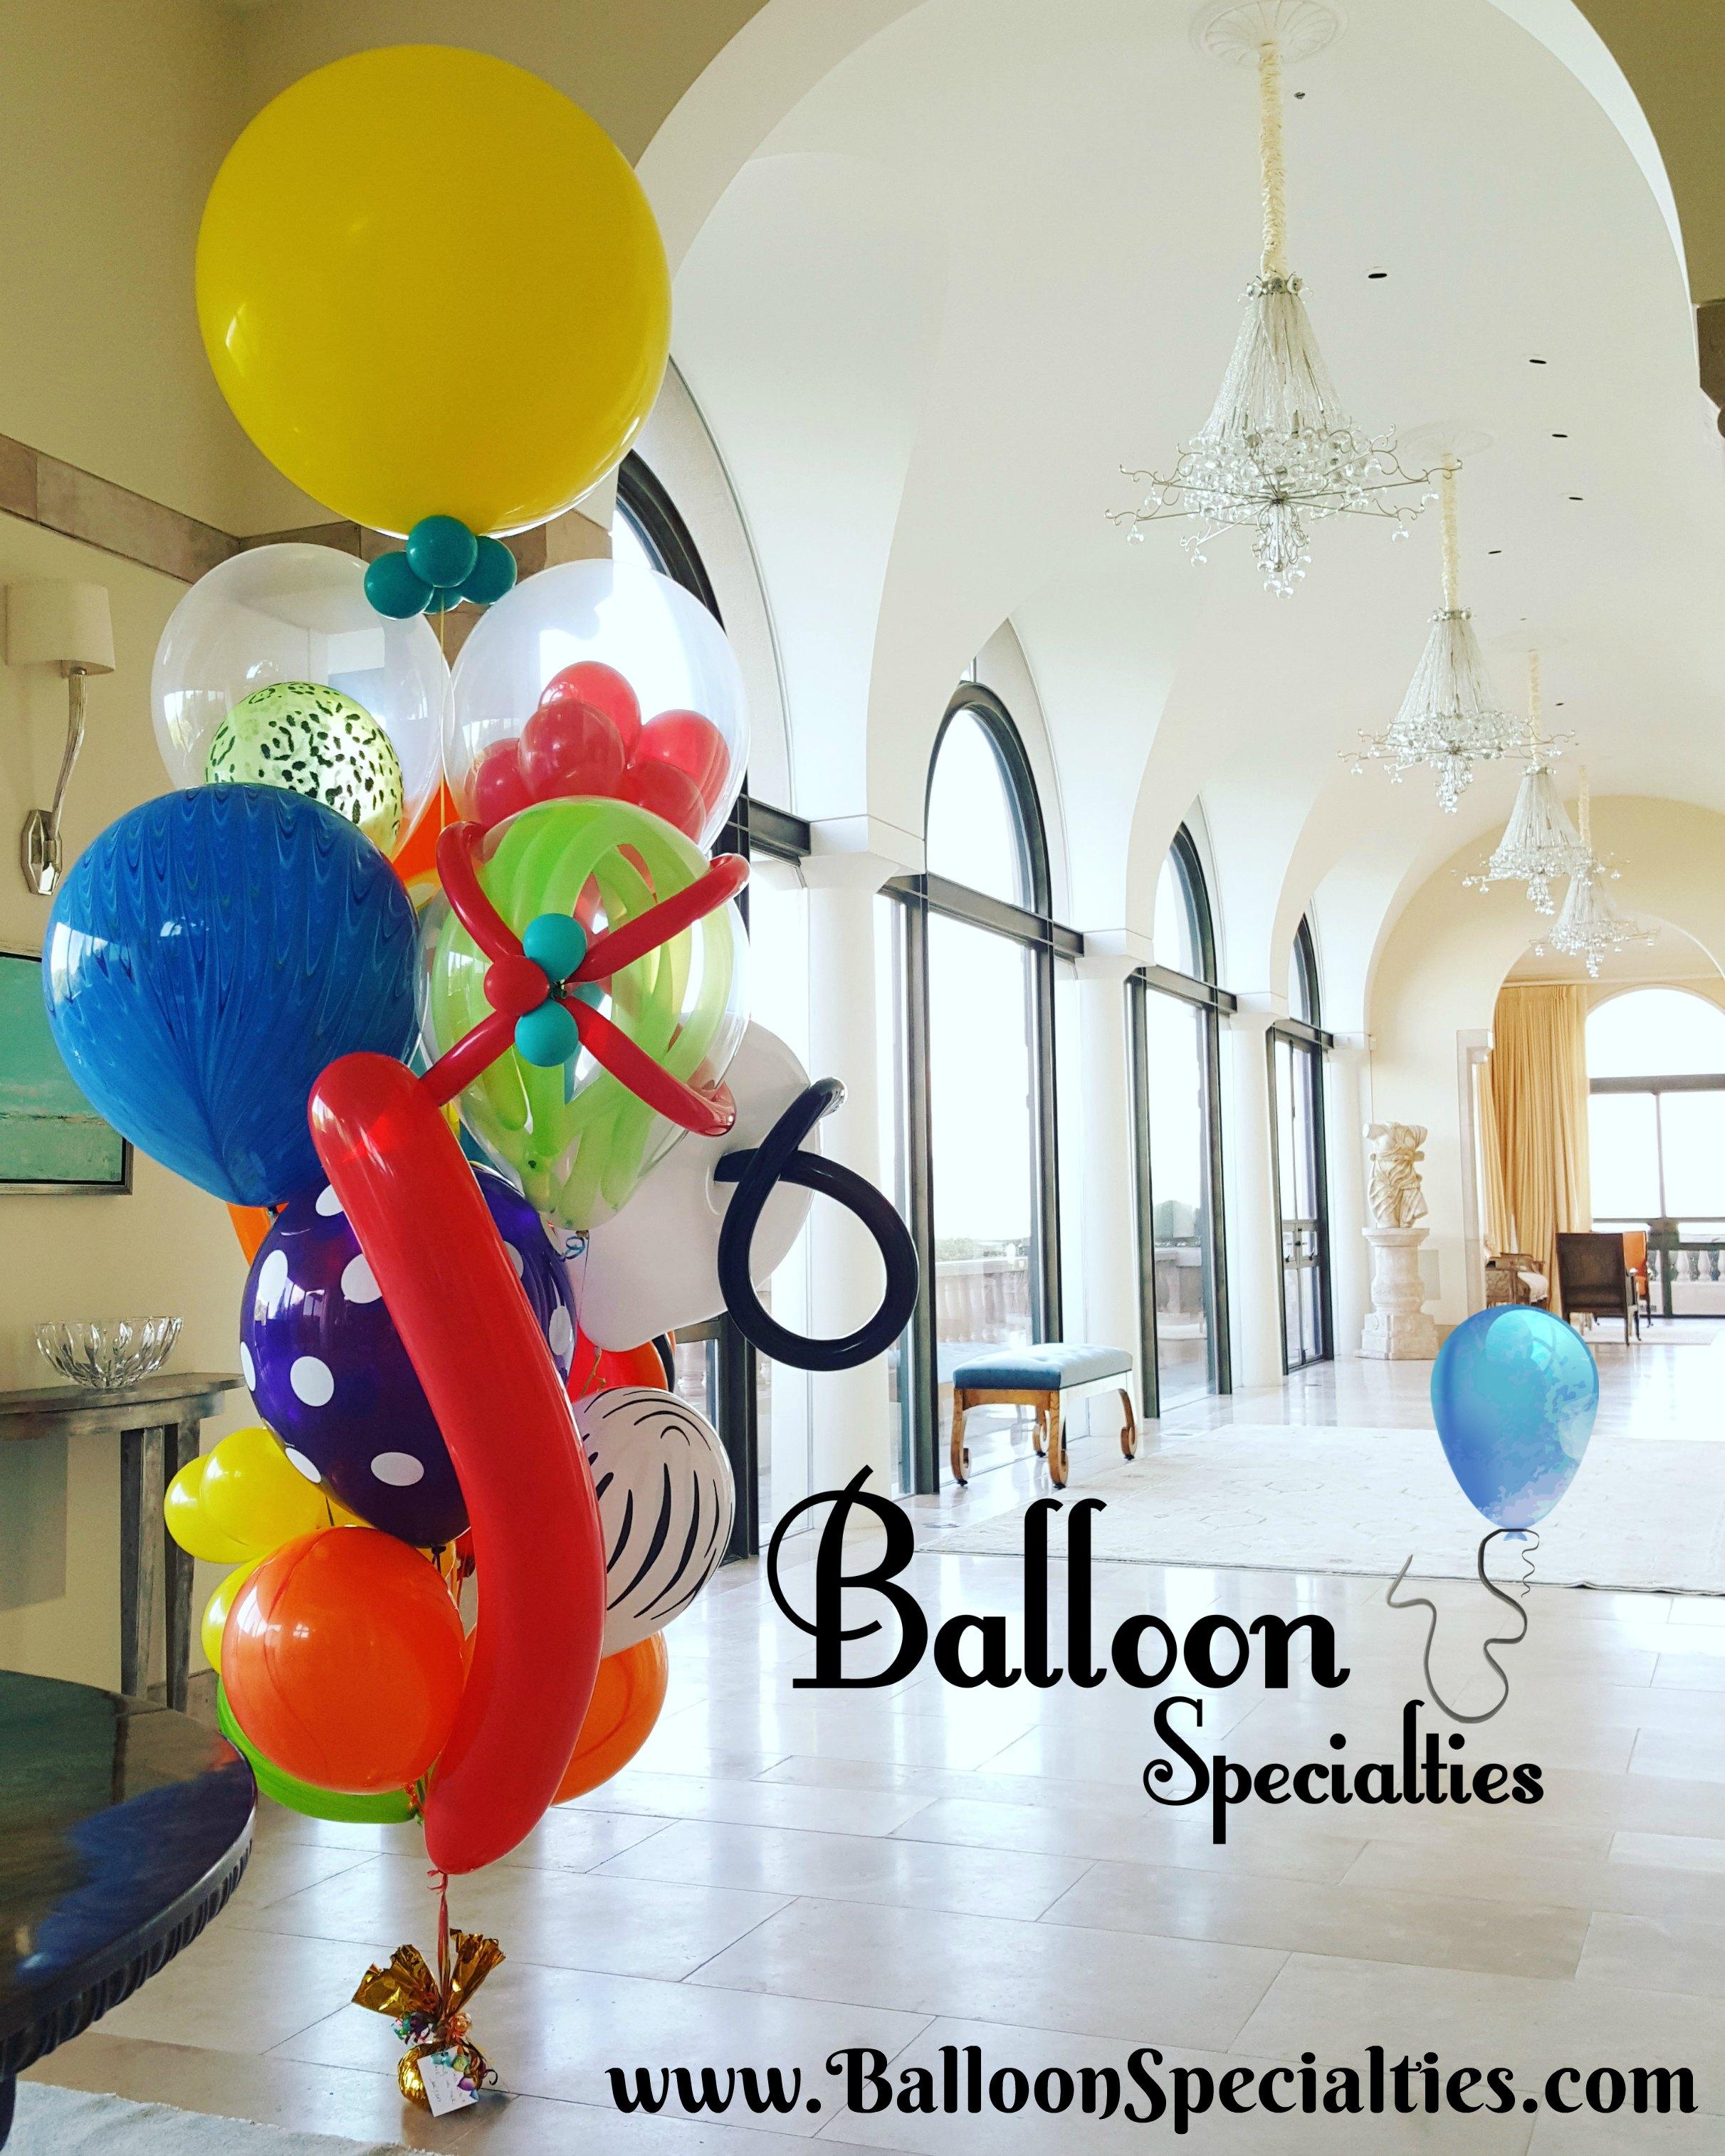 Balloon Specialties All Latex Bouquet.jpg